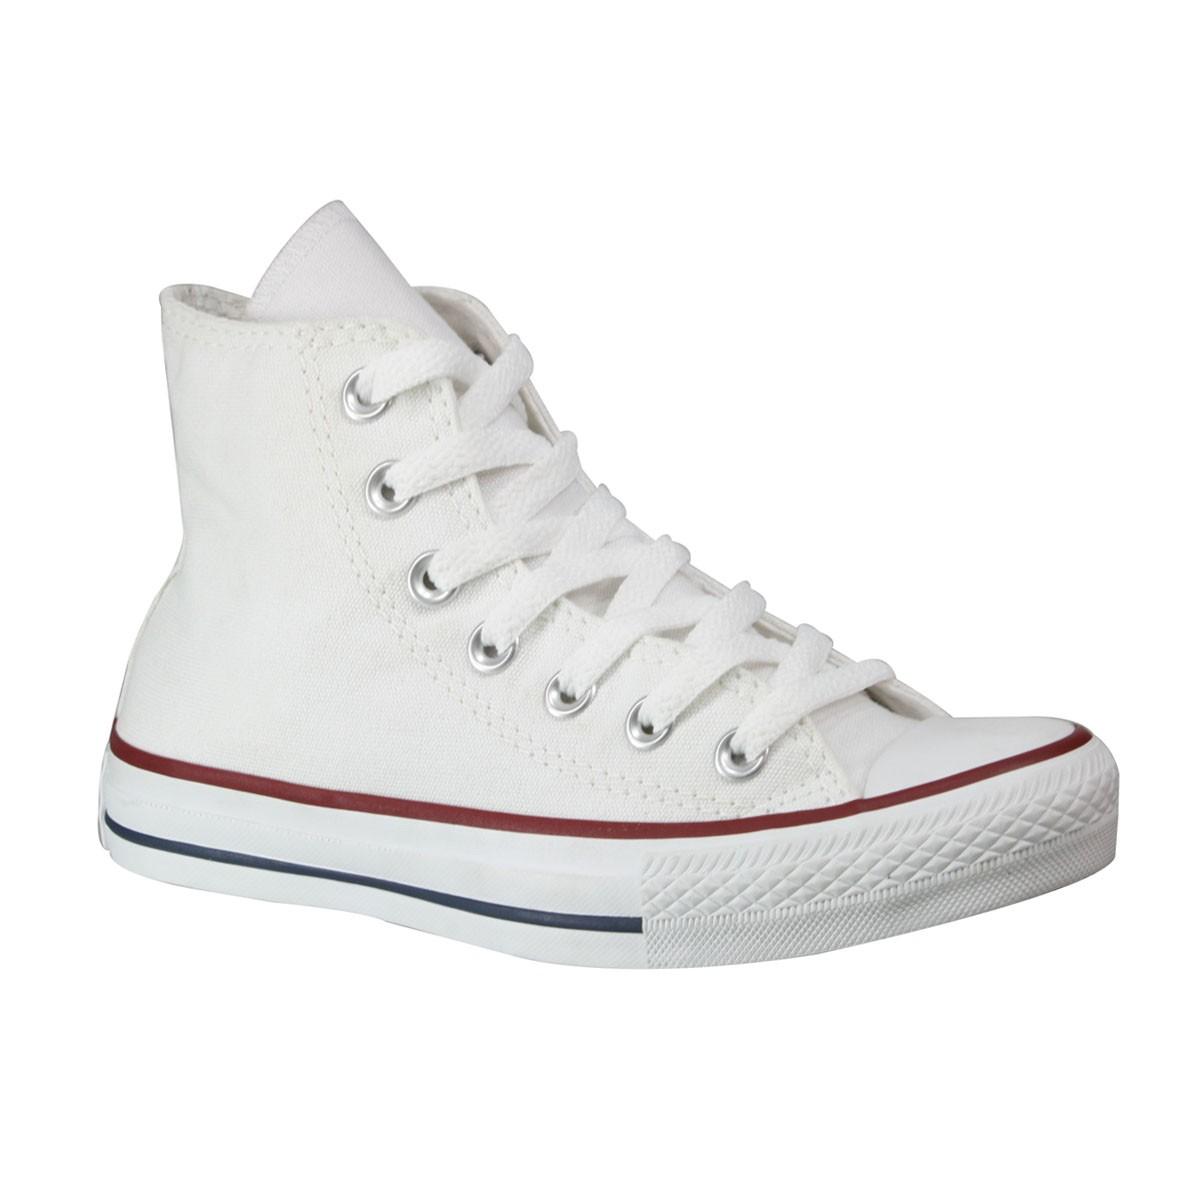 Tênis All Star Converse Chuck Taylor Monochrome Hi CT0004.0001 Branco 90b4337dbb02a